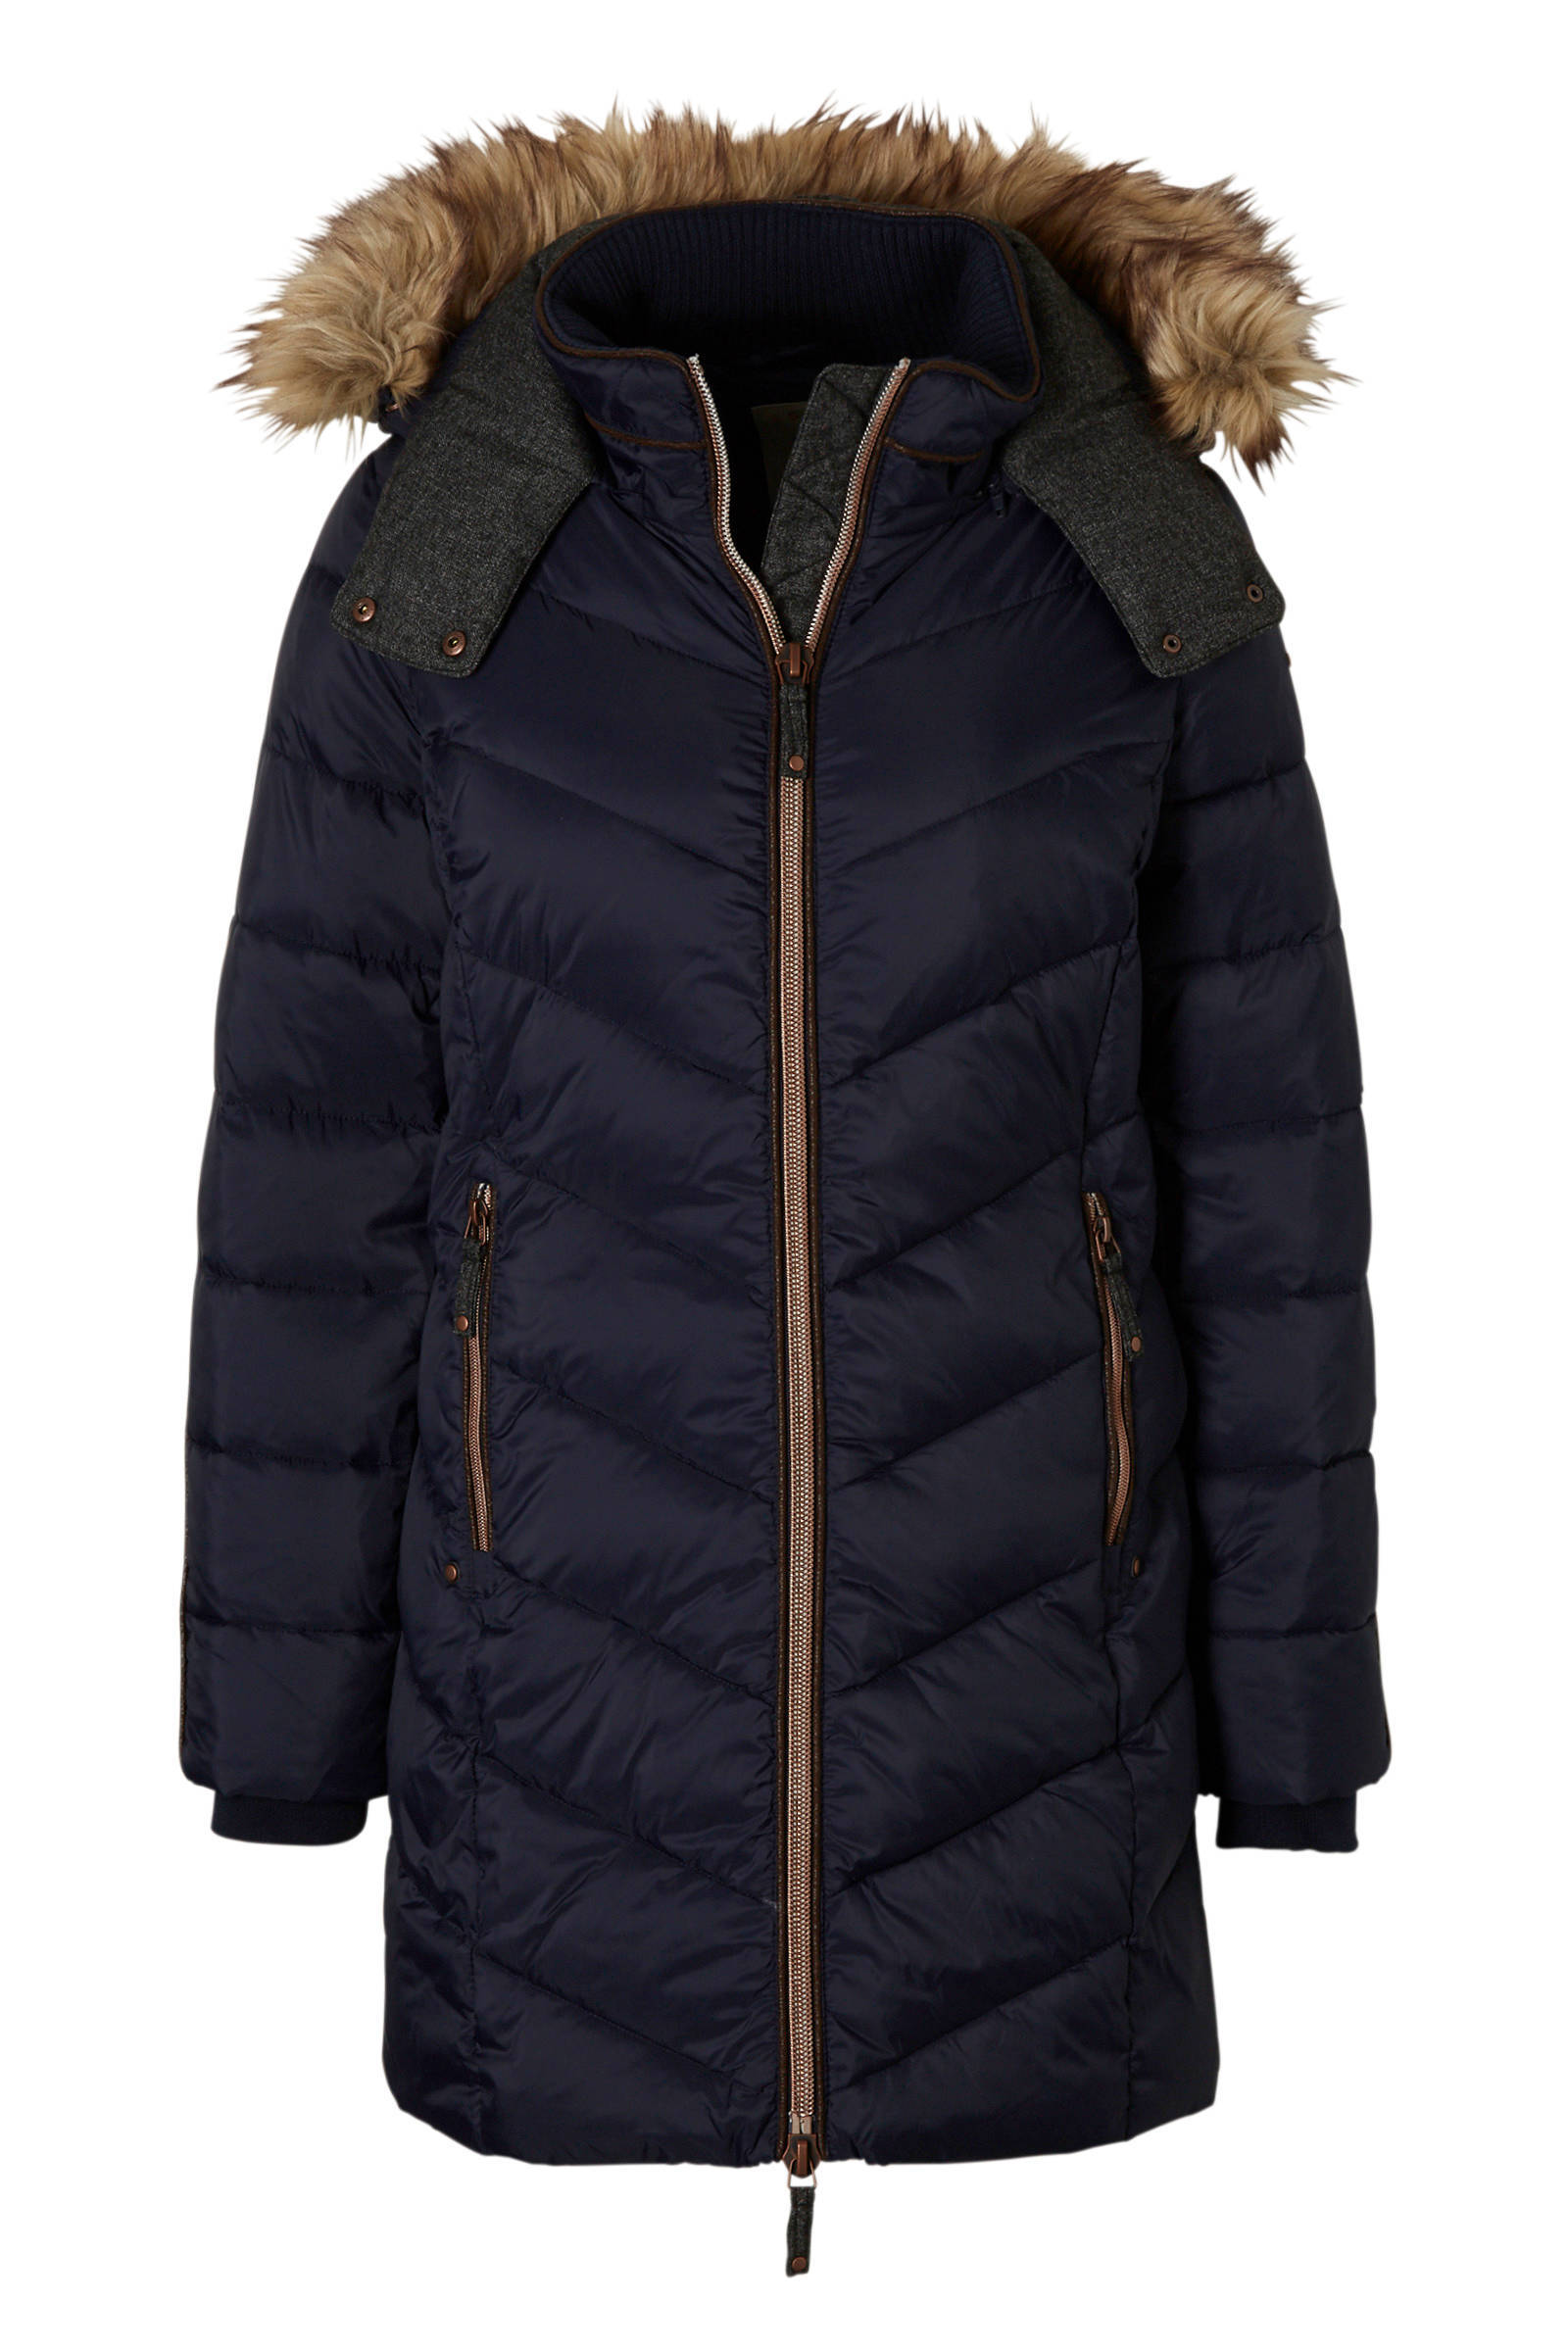 winterjas mantel